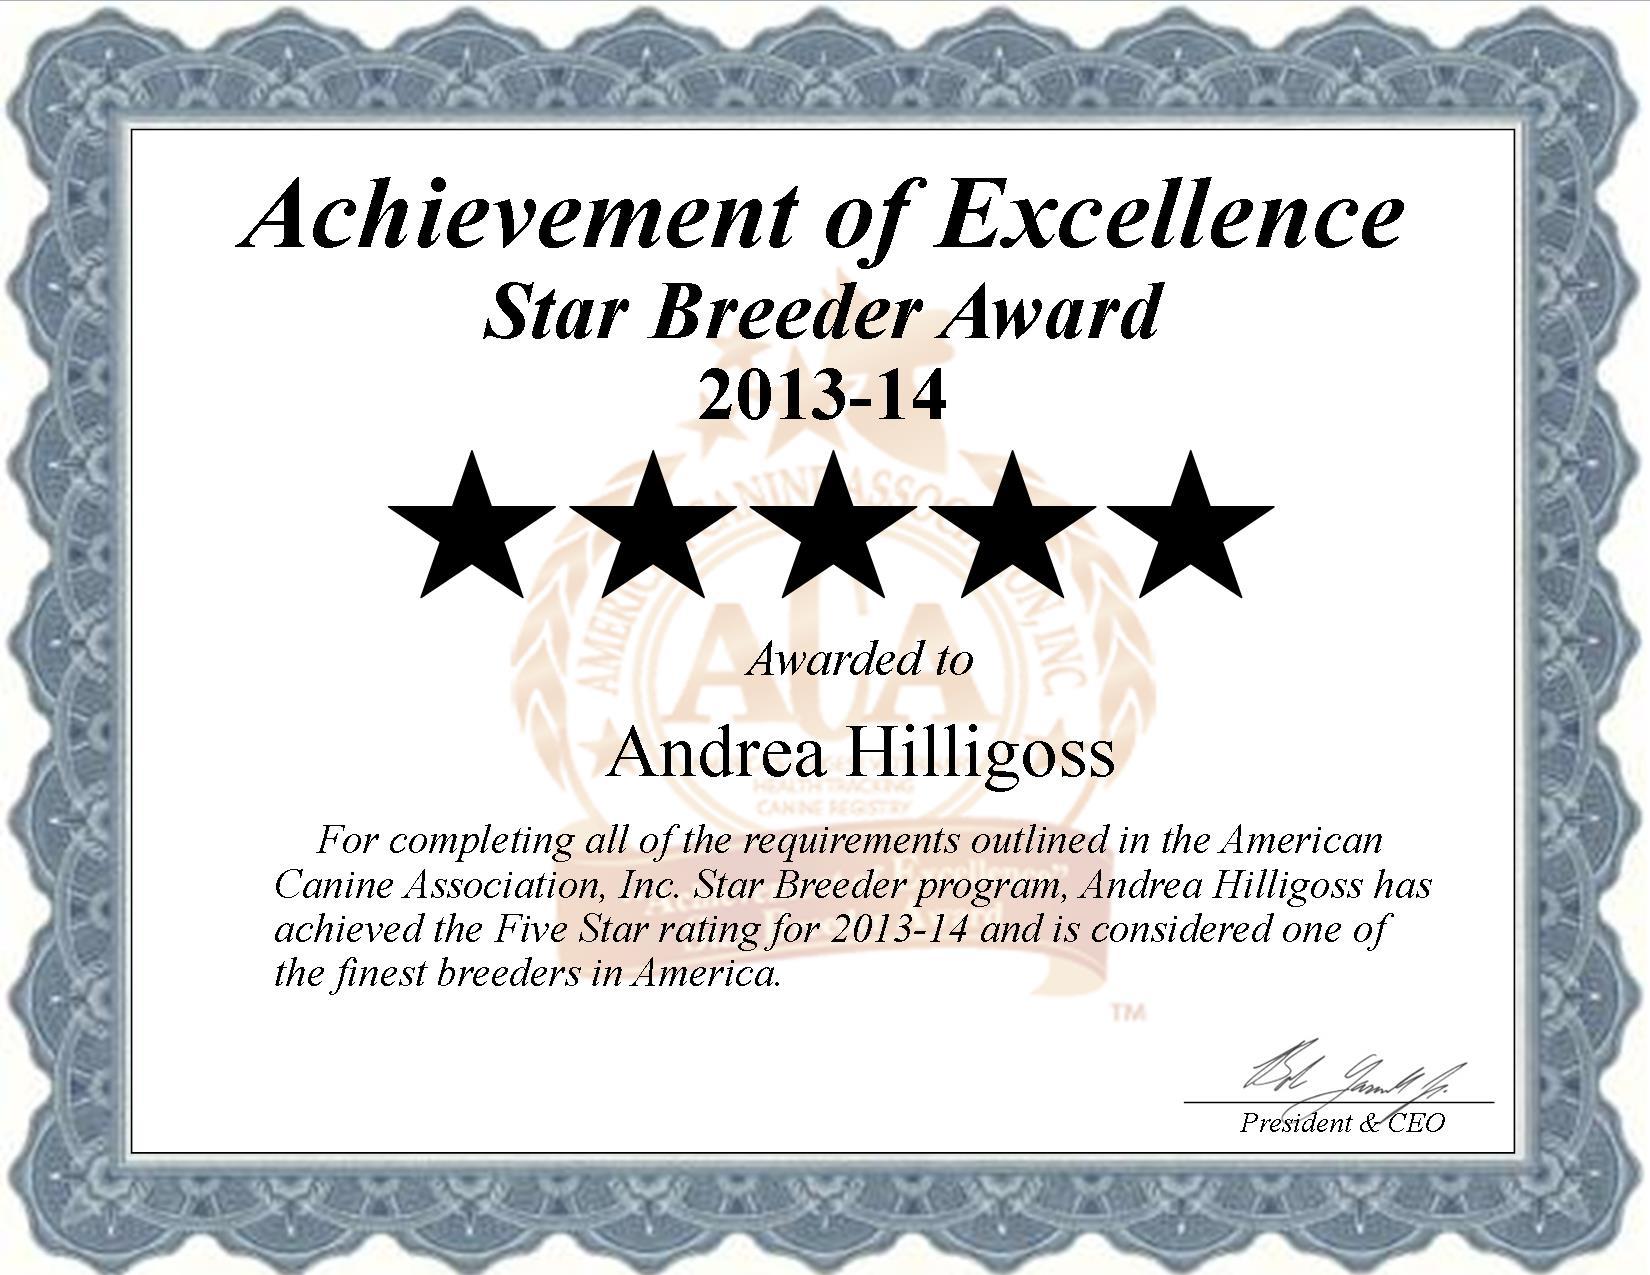 Andrea, Hilligoss, Andrea Hilligoss, Hilligoss Kennel, breeder, star breeder, aca, star breeder, 2 star, ketchum, oklahoma, ok, dog, puppy, puppies;